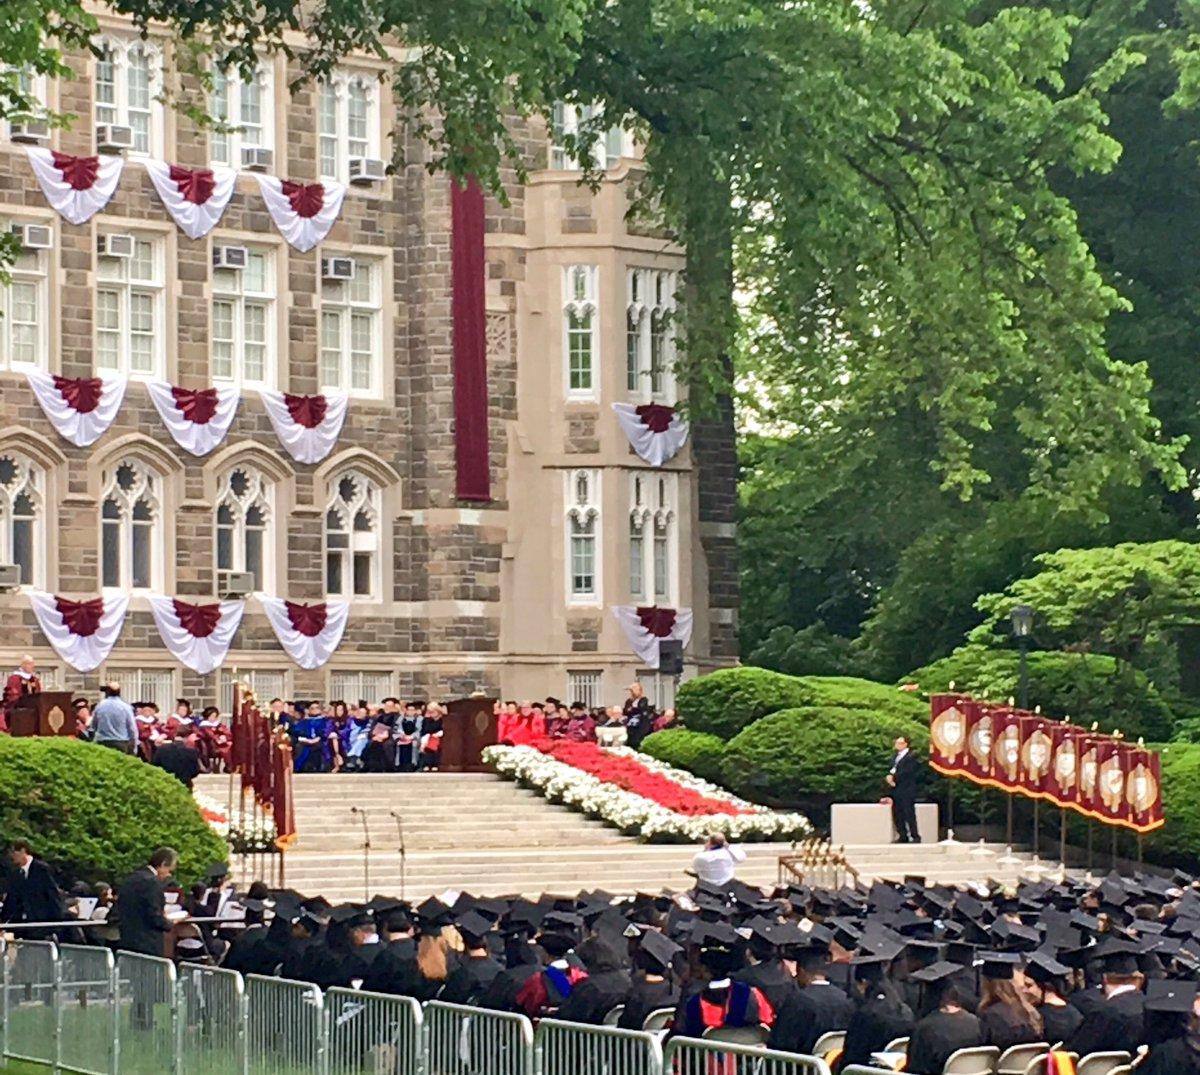 The head of @smithsonian, Dr. David Skorton addresses @fordhamnotes 2016 commencement #FordhamUniversity https://t.co/xygJo3BEwY